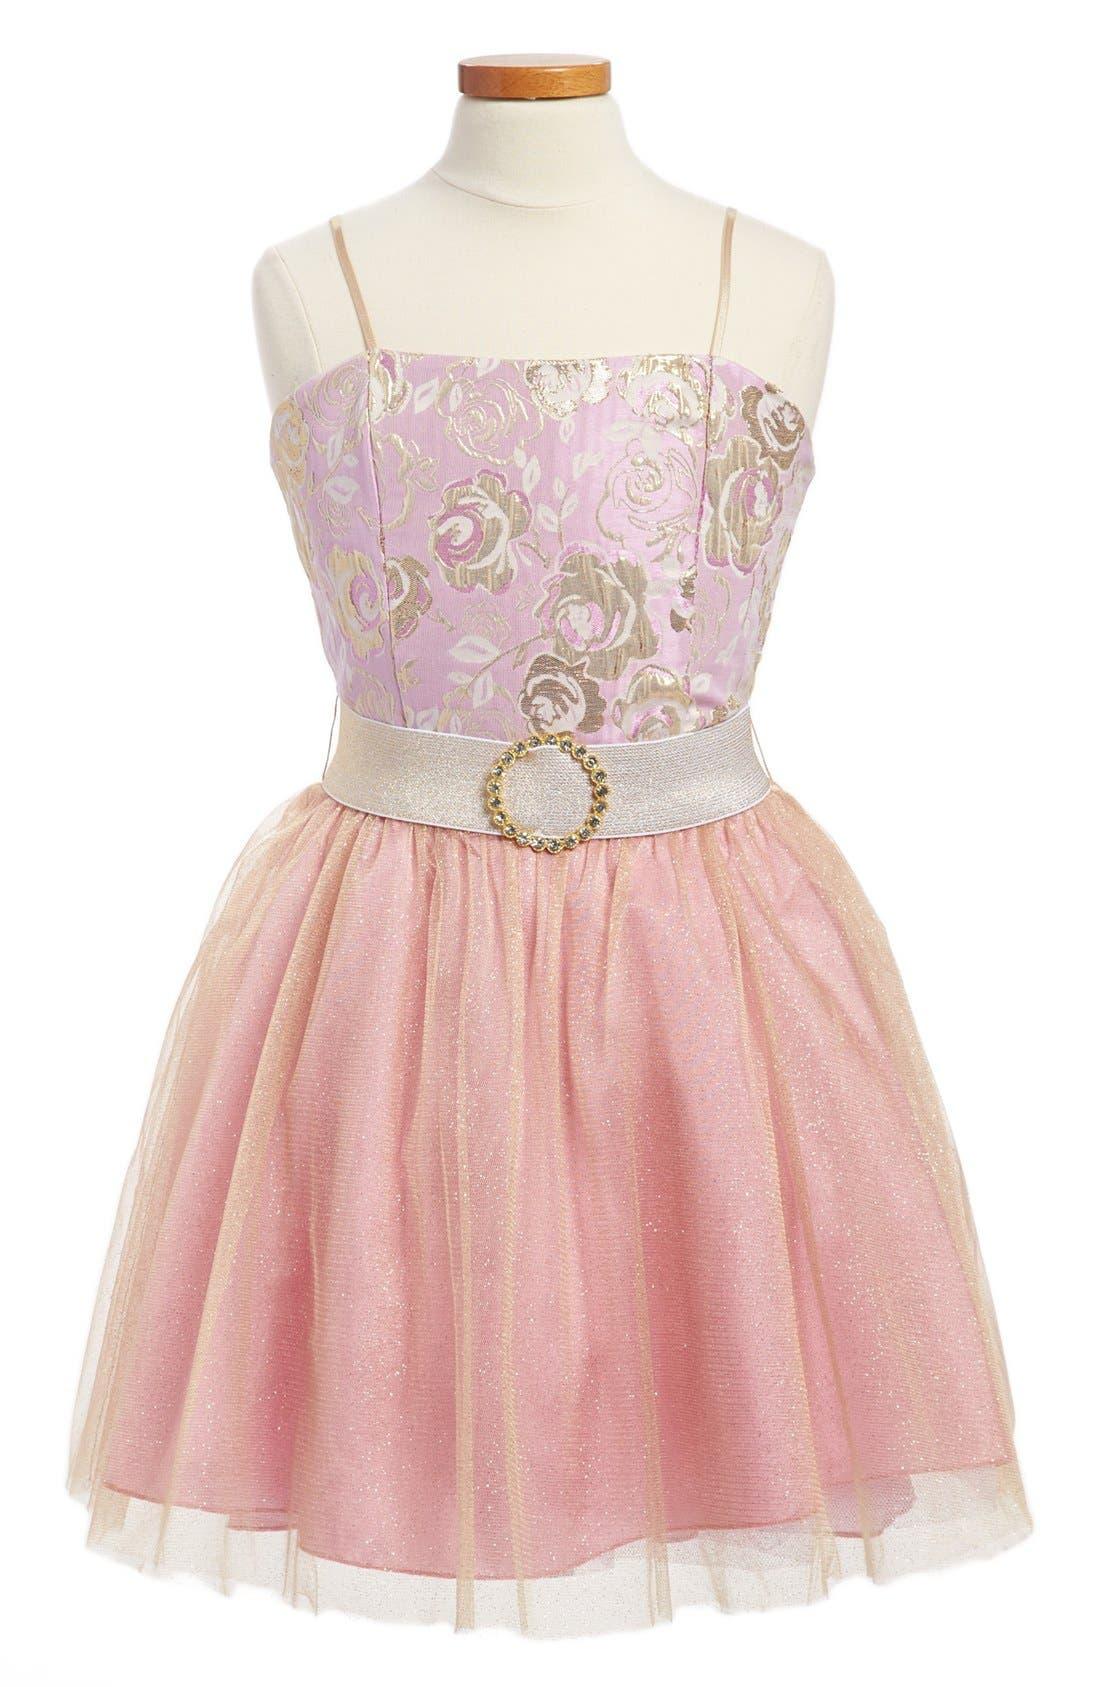 Alternate Image 1 Selected - Un Deux Trois Brocade & Tulle Dress (Big Girls)